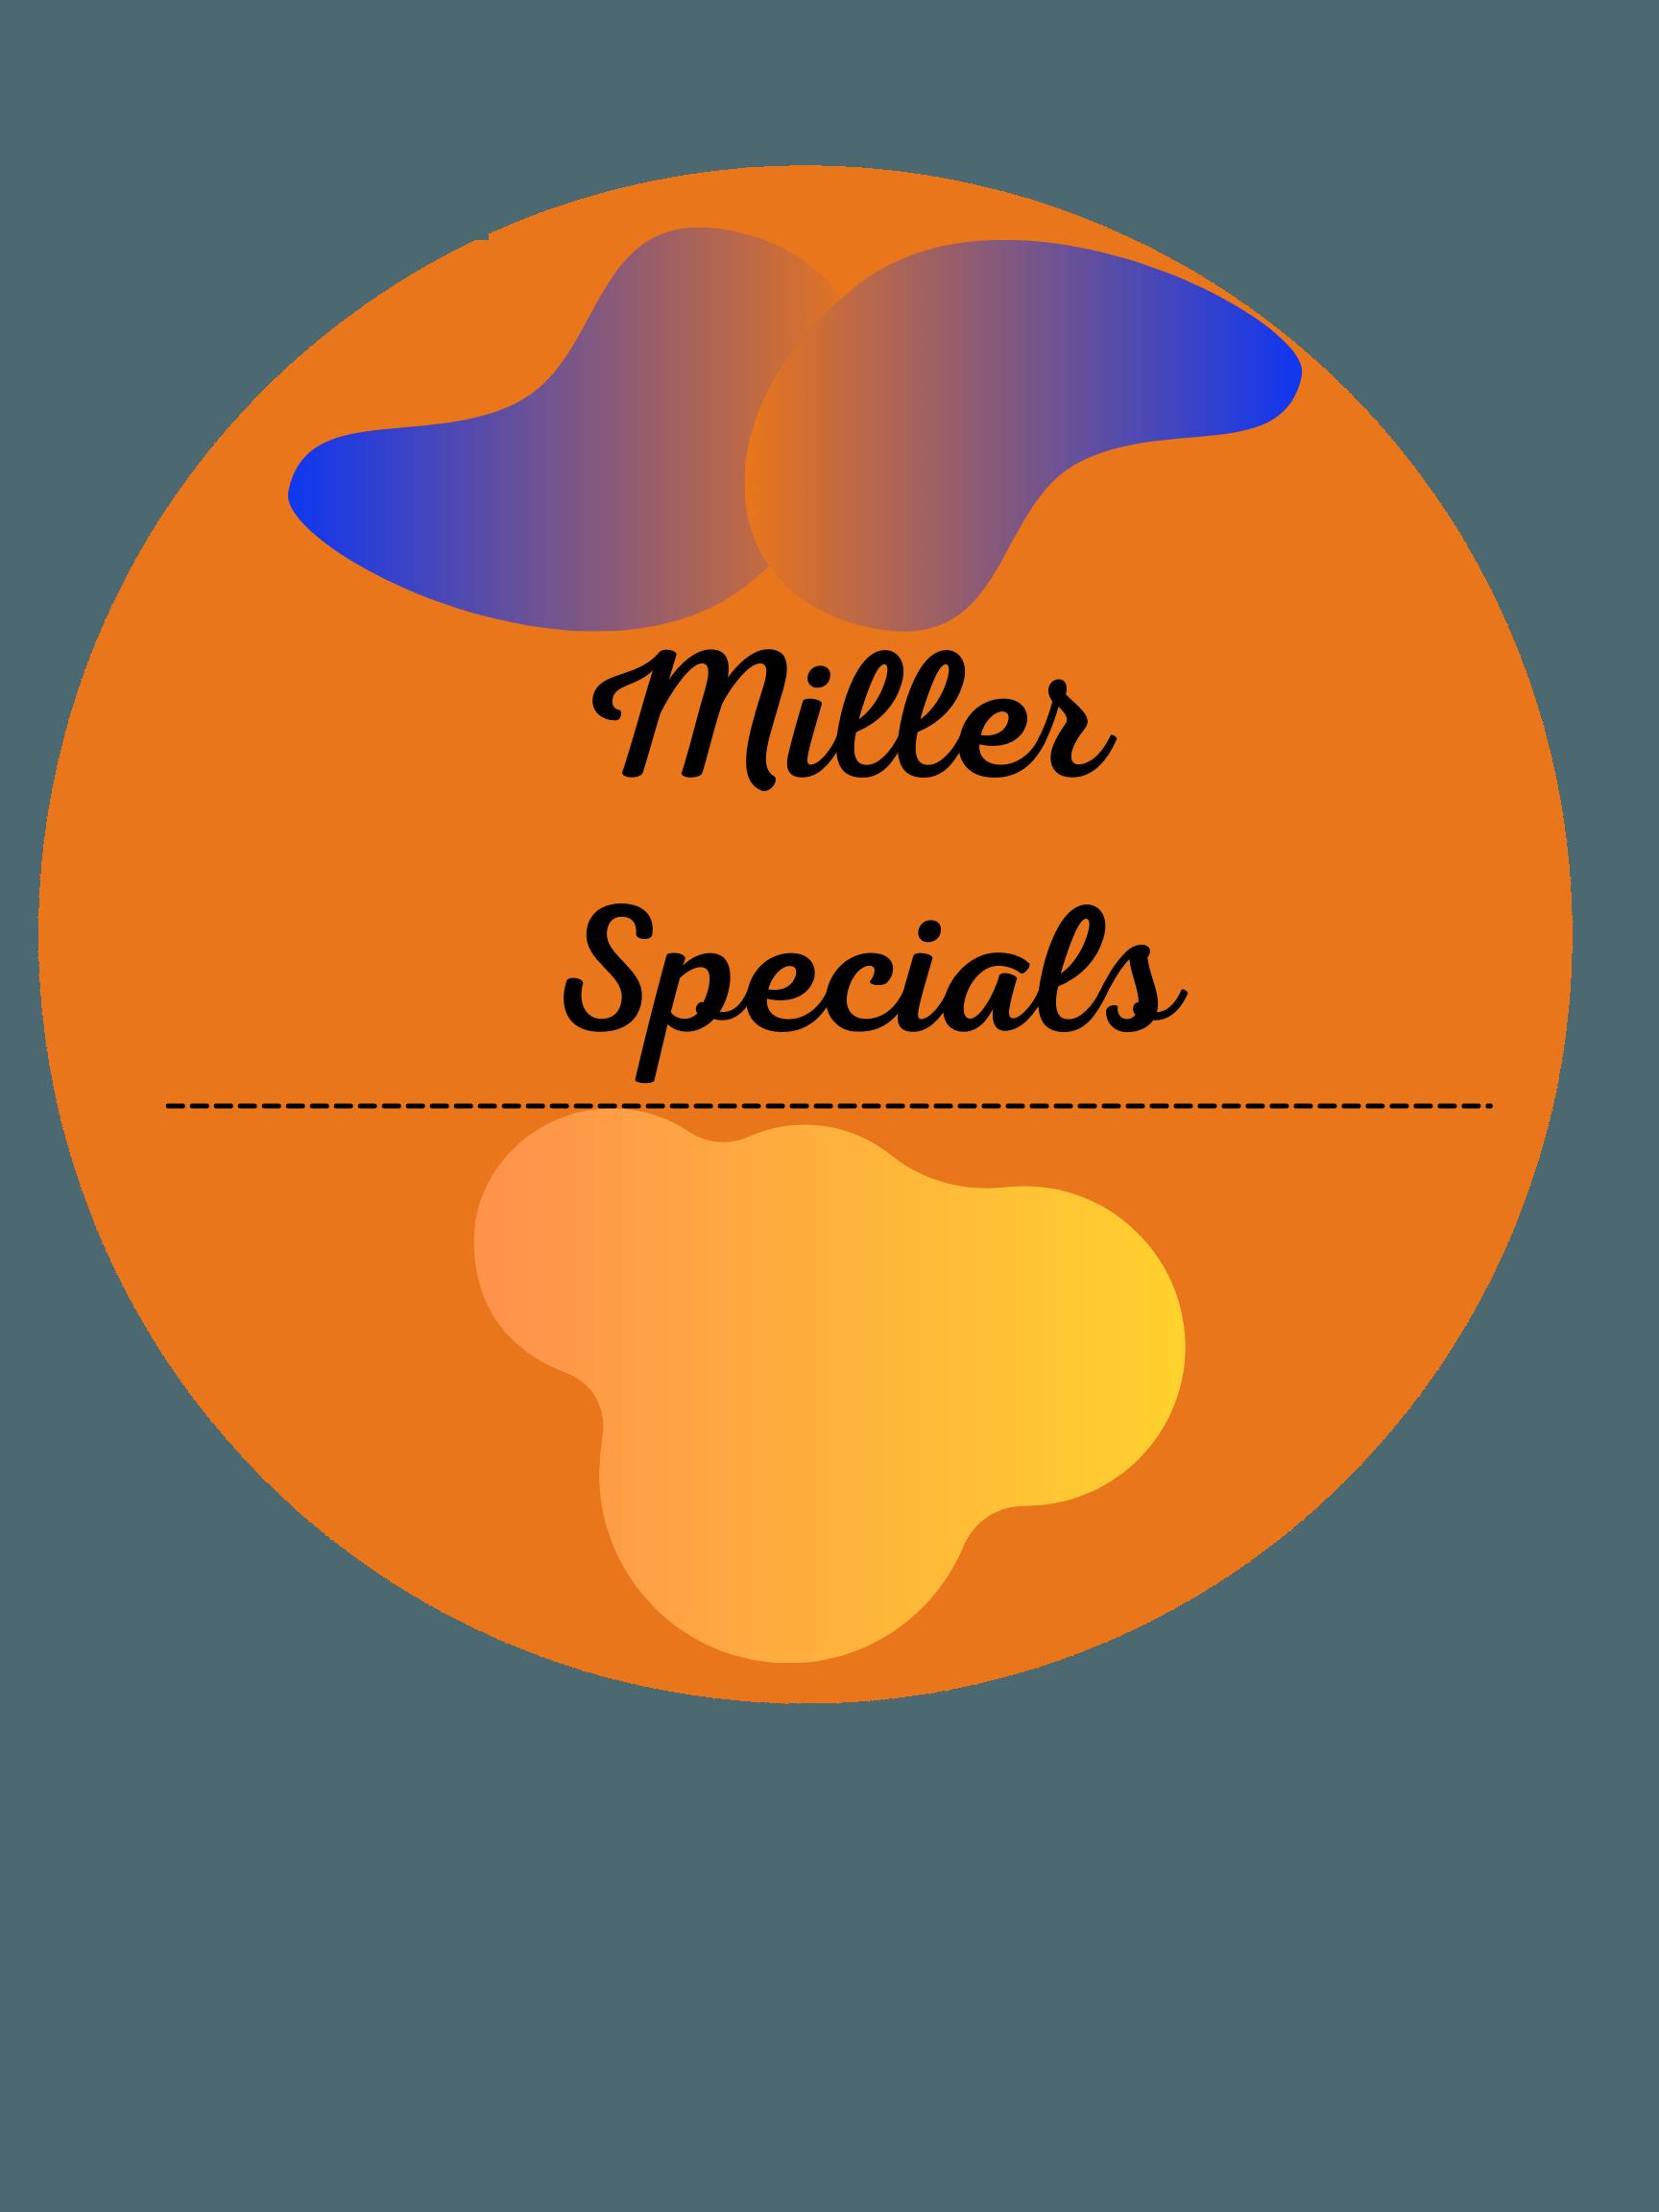 Miller Specials WR